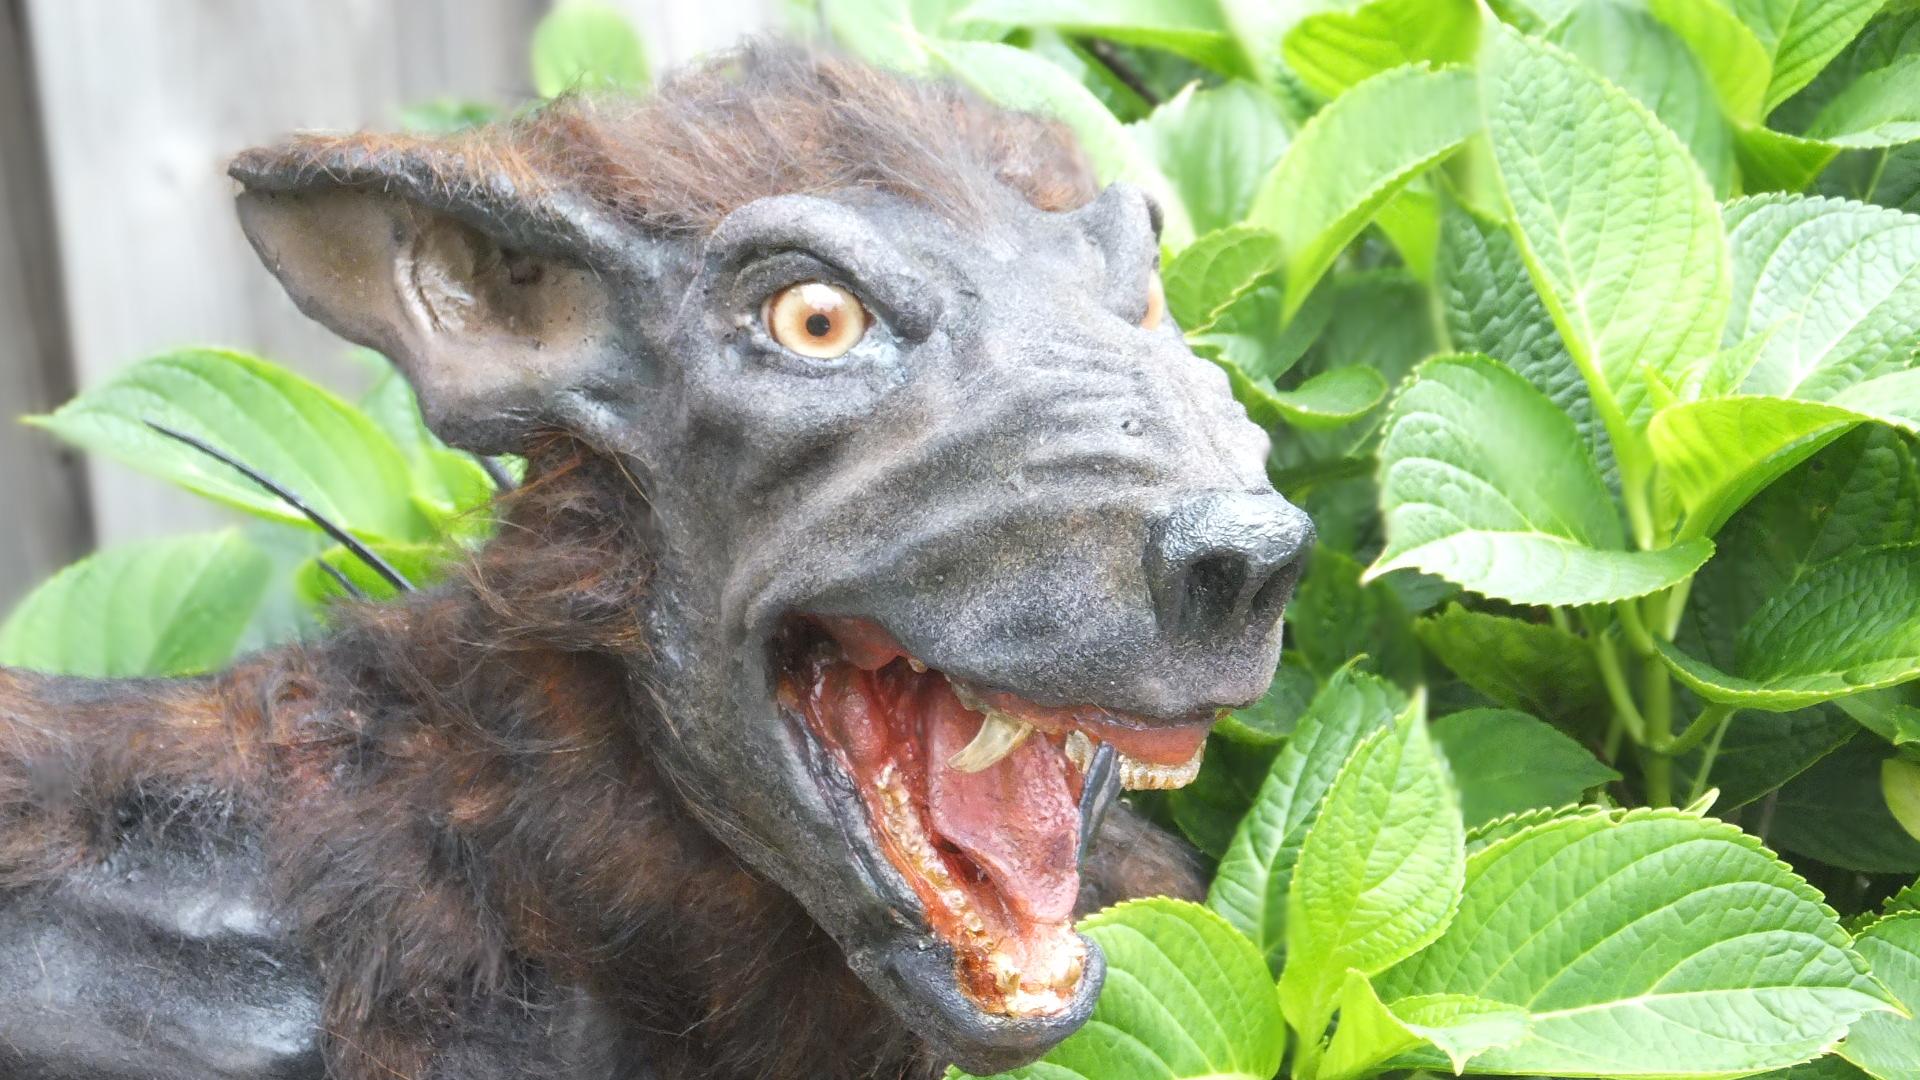 Chupacabra creature